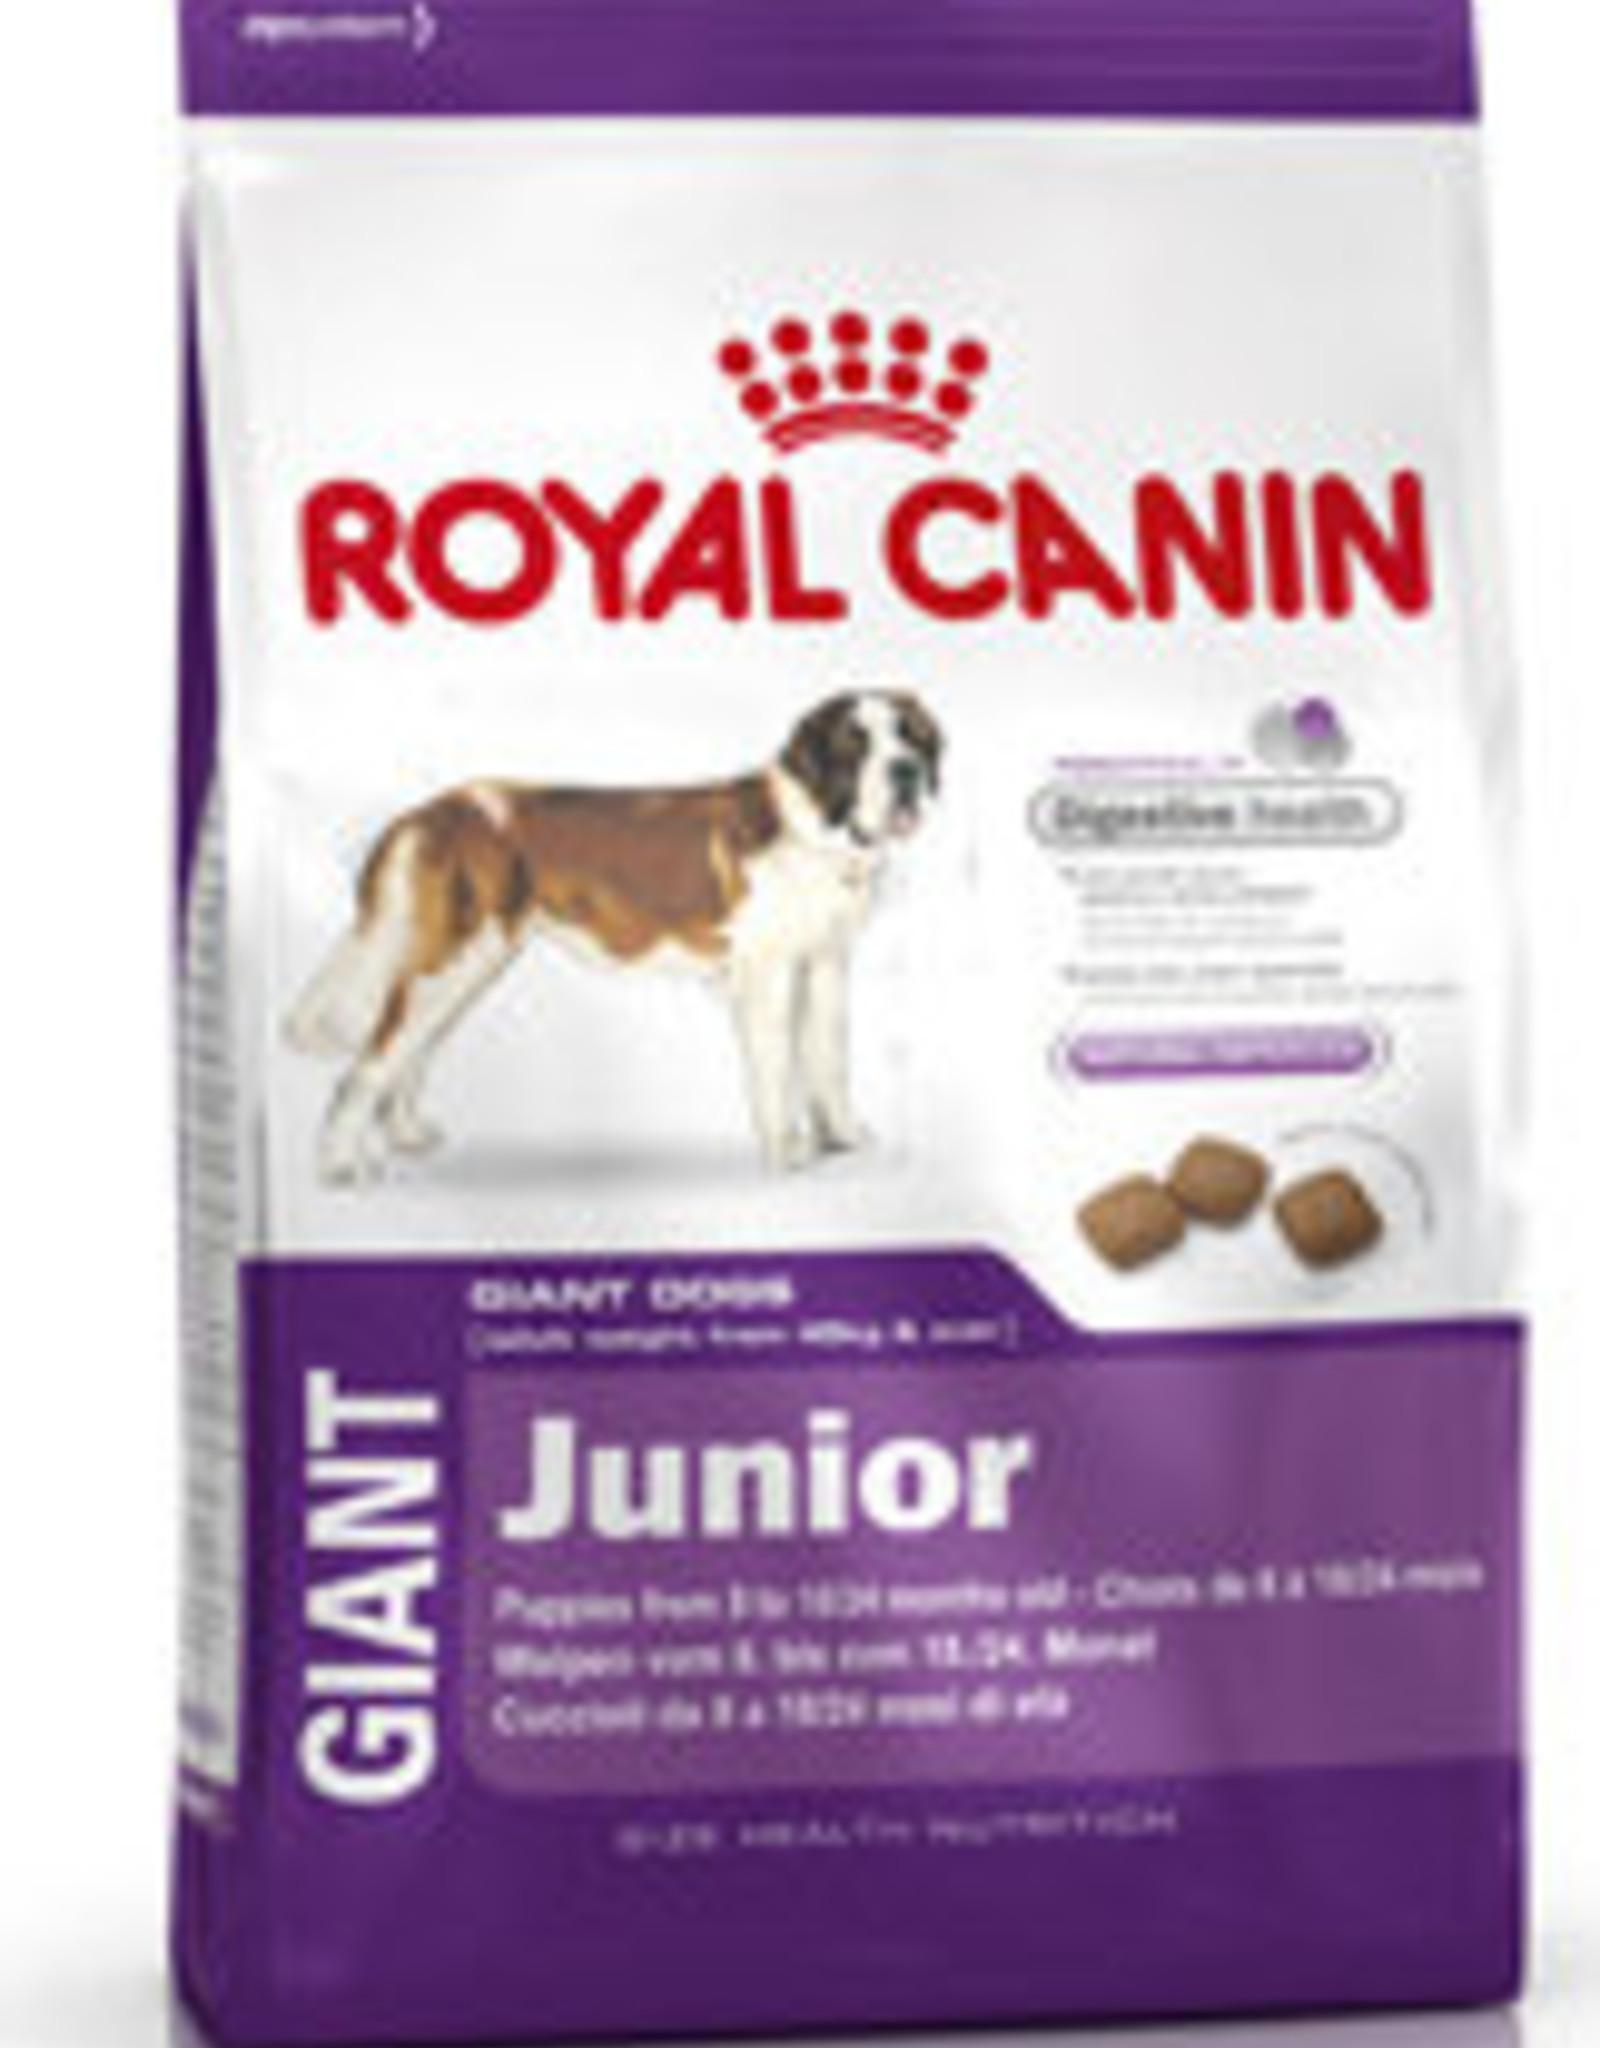 Royal Canin Royal Canin Shn Giant Junior Hund 15kg